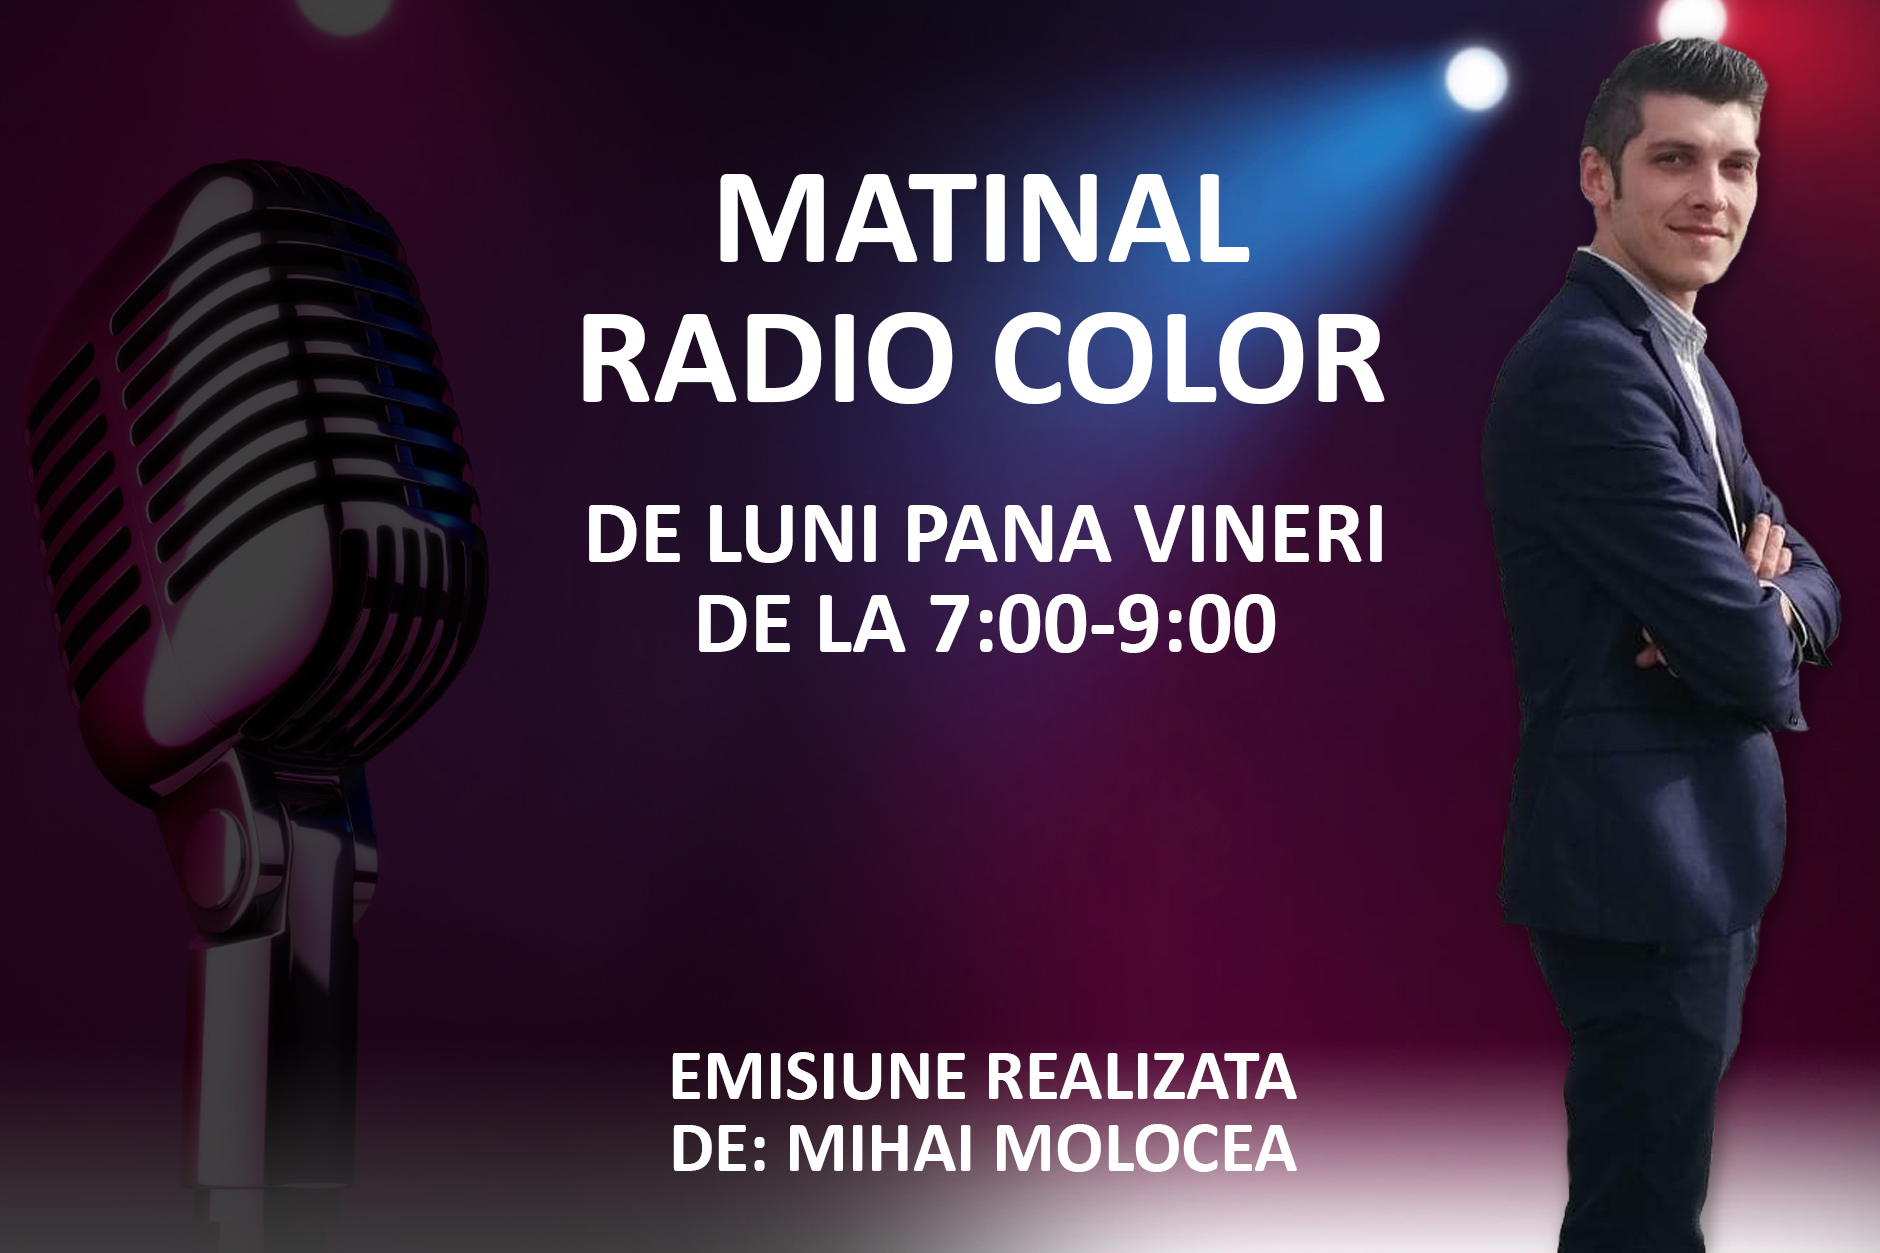 Matinal Radio Color